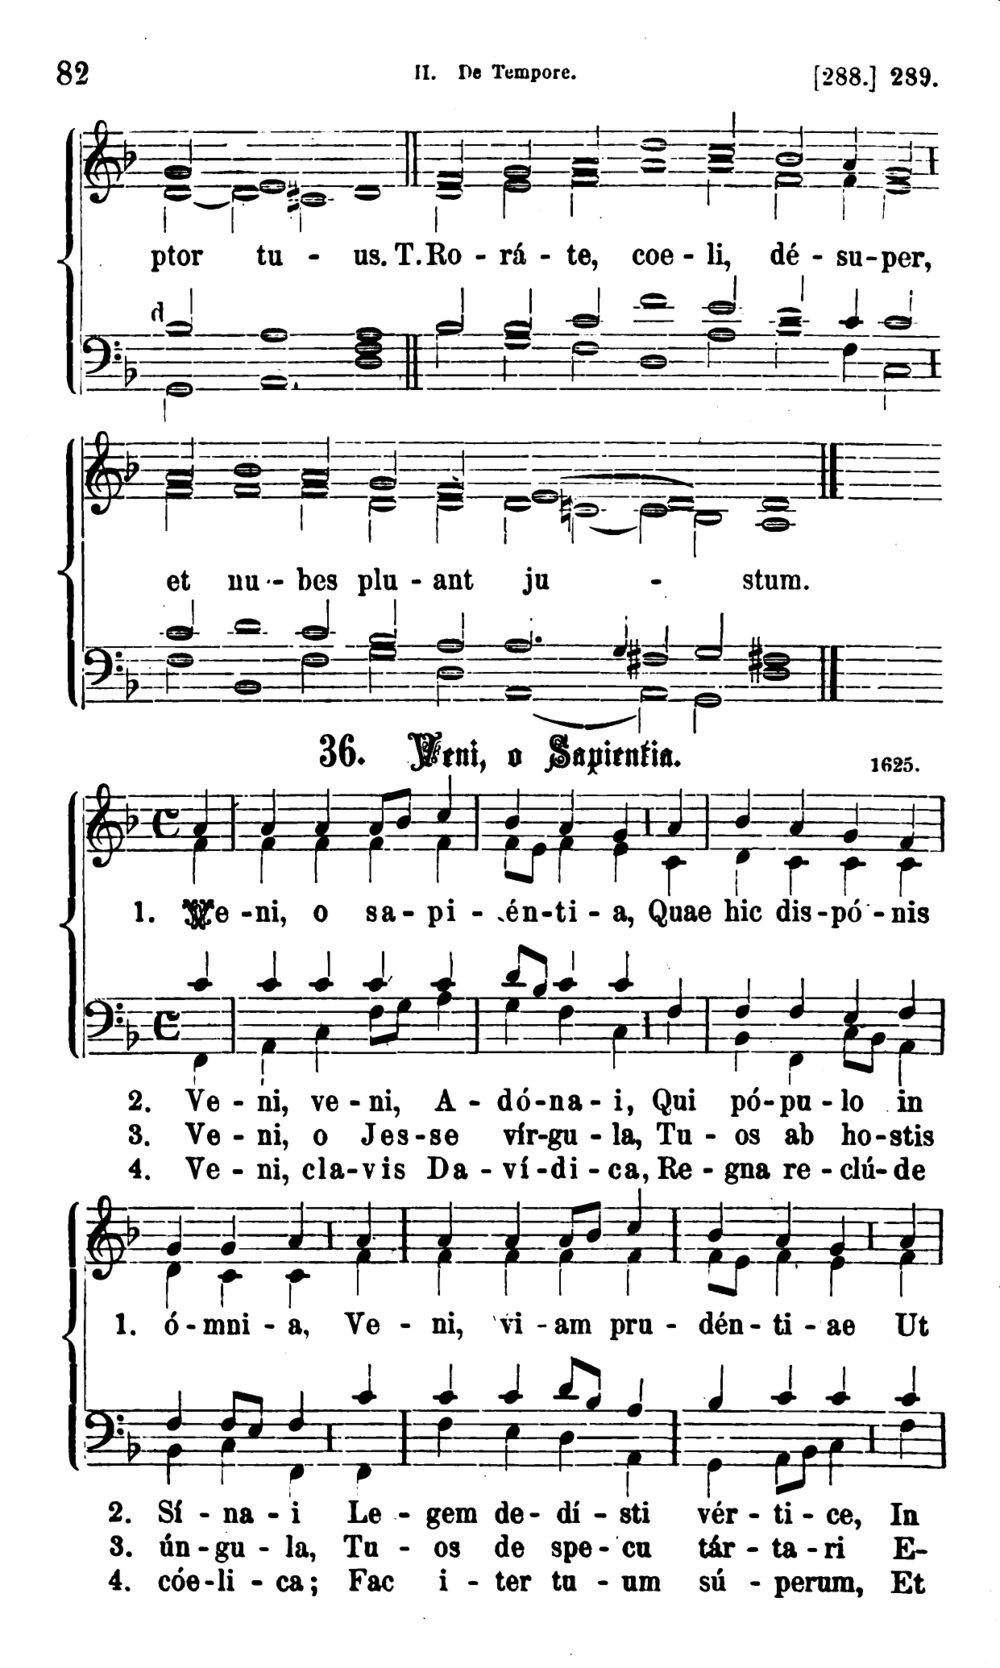 Cantiones_sacrae_1878-see82-94.jpg